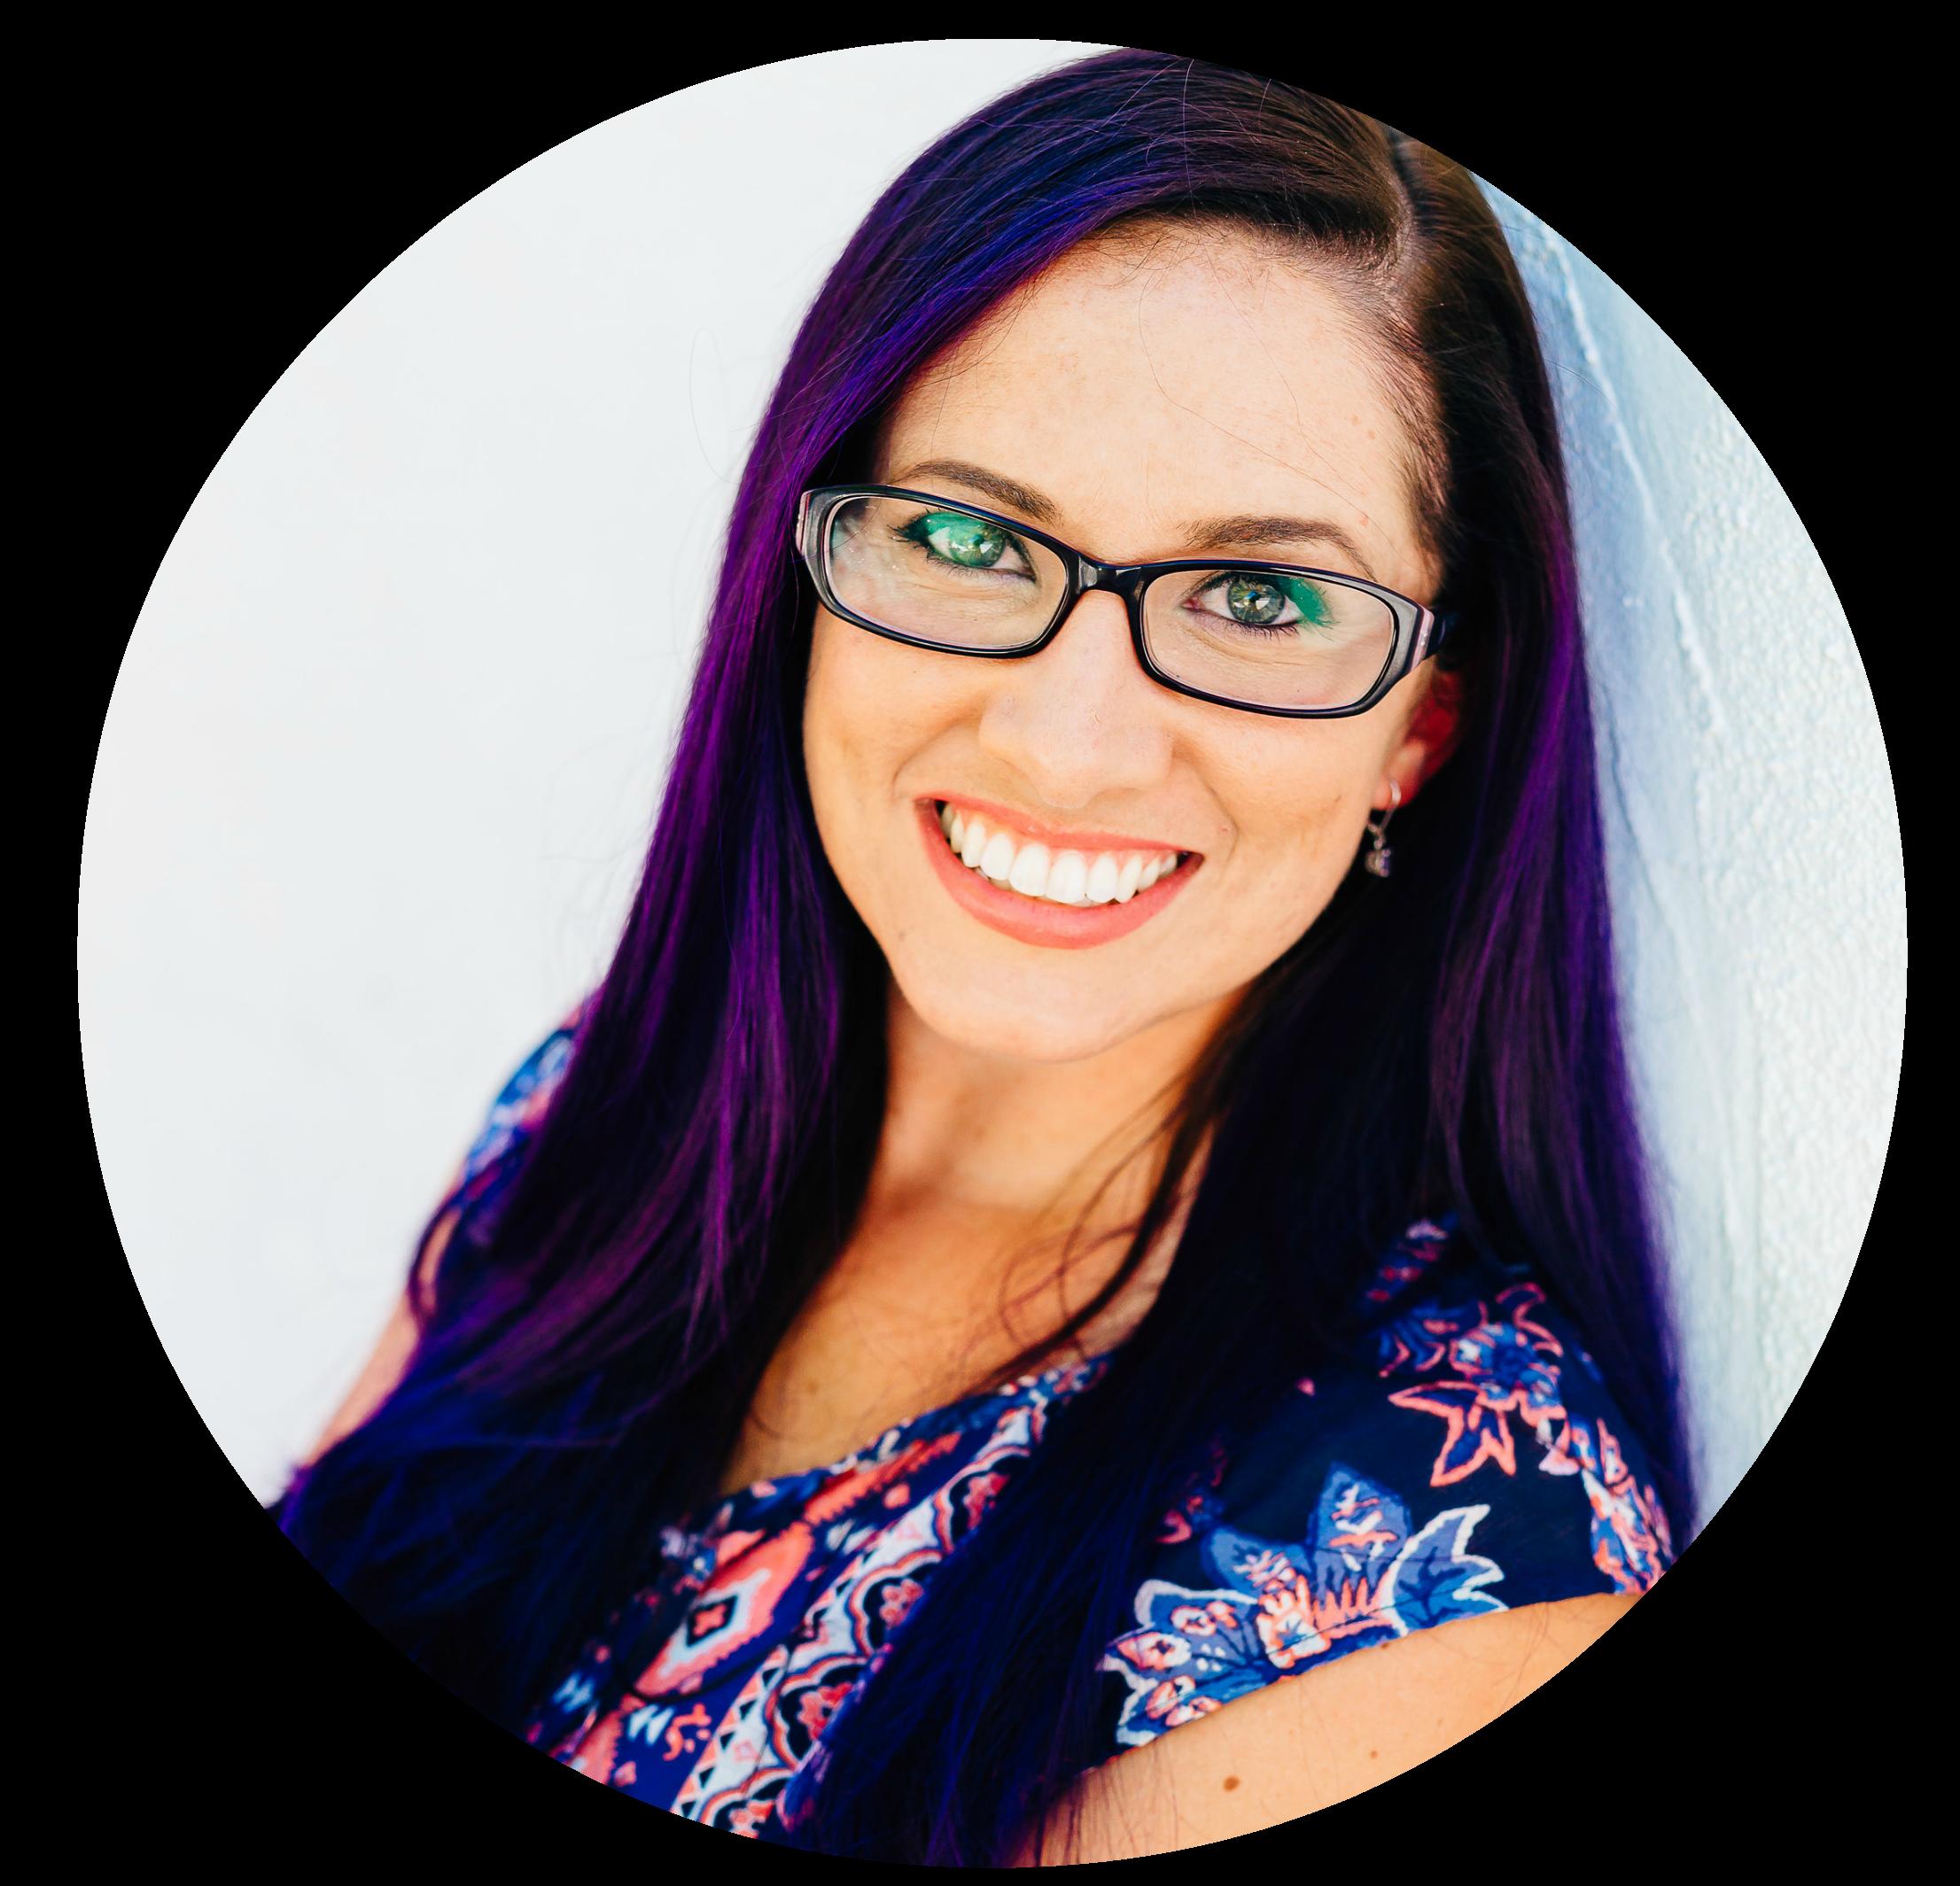 Jessica Rasdall Motivational Speaker and Public Speaking Strategist